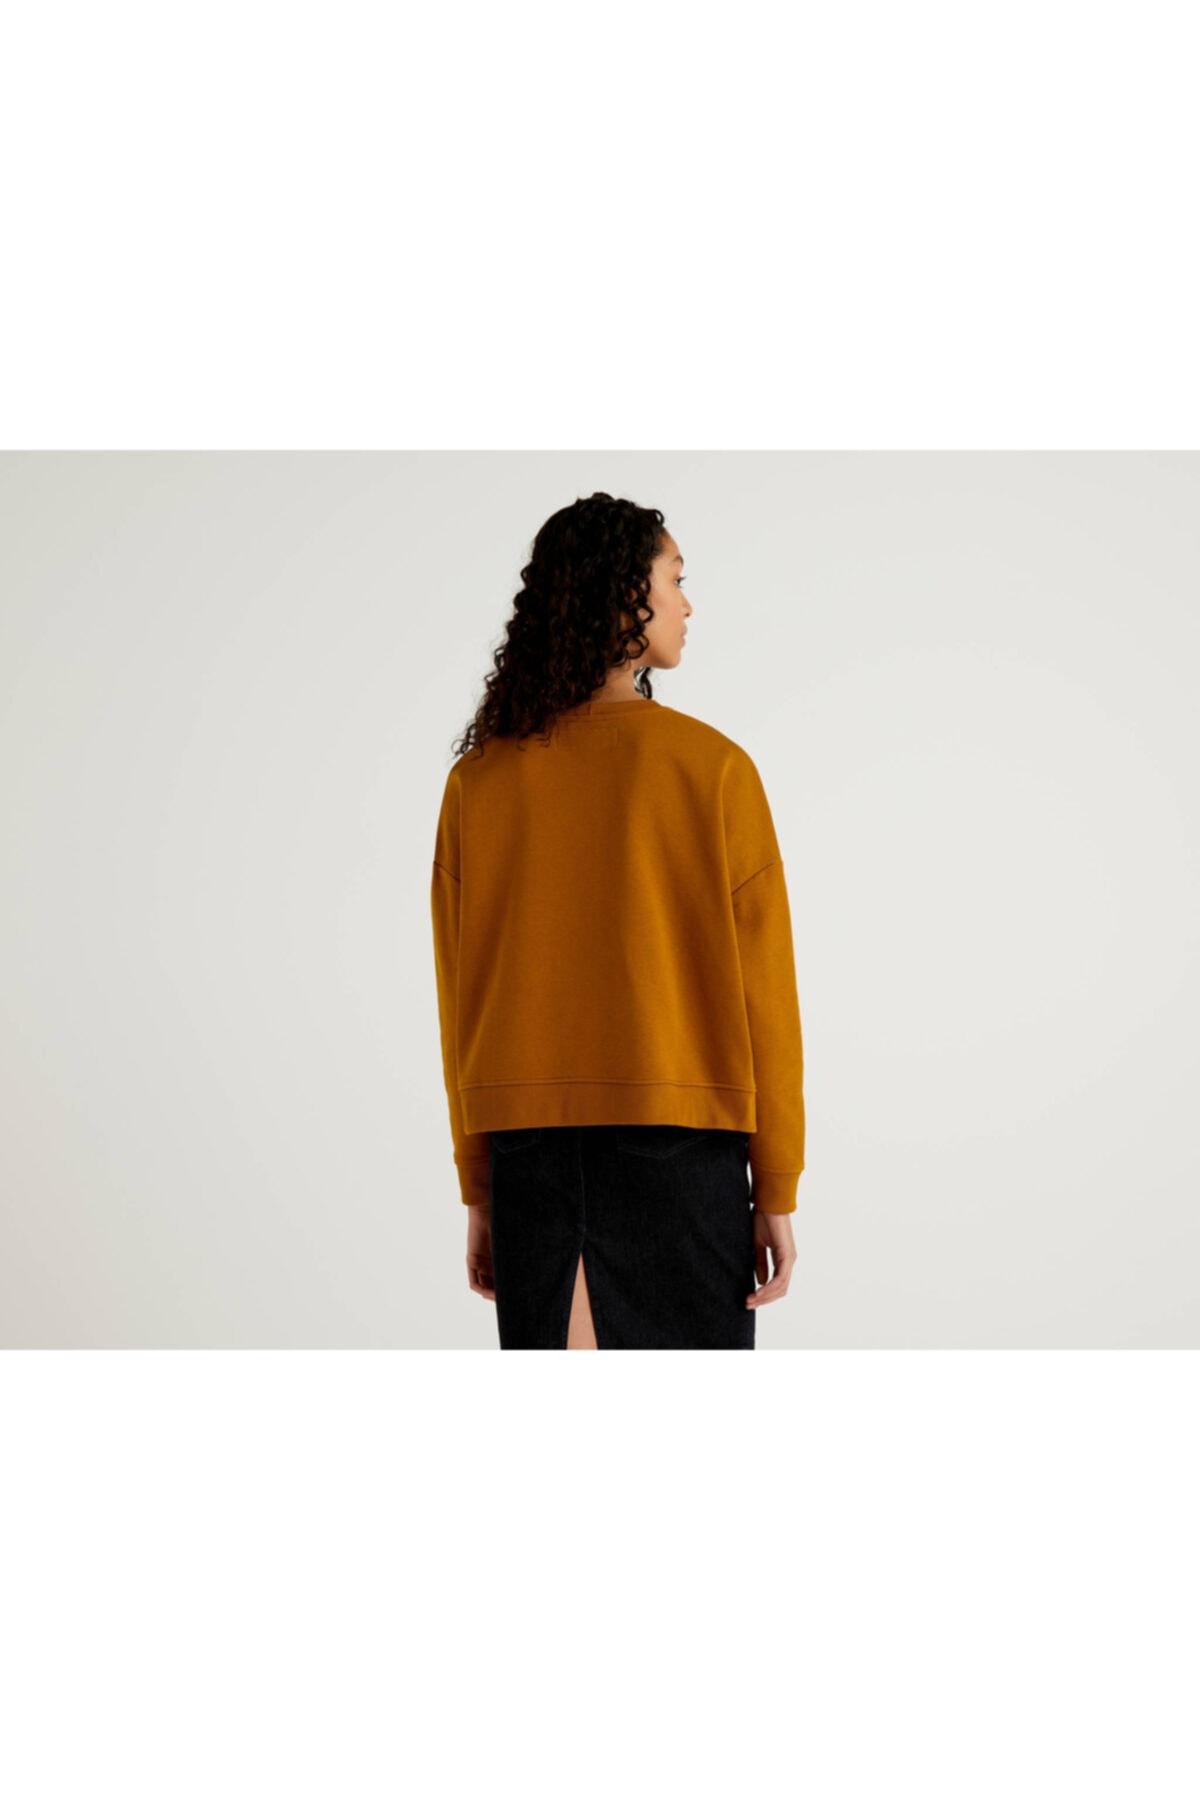 United Colors of Benetton Kadın Kahverengi Takma Cepli Sweatshirt 2